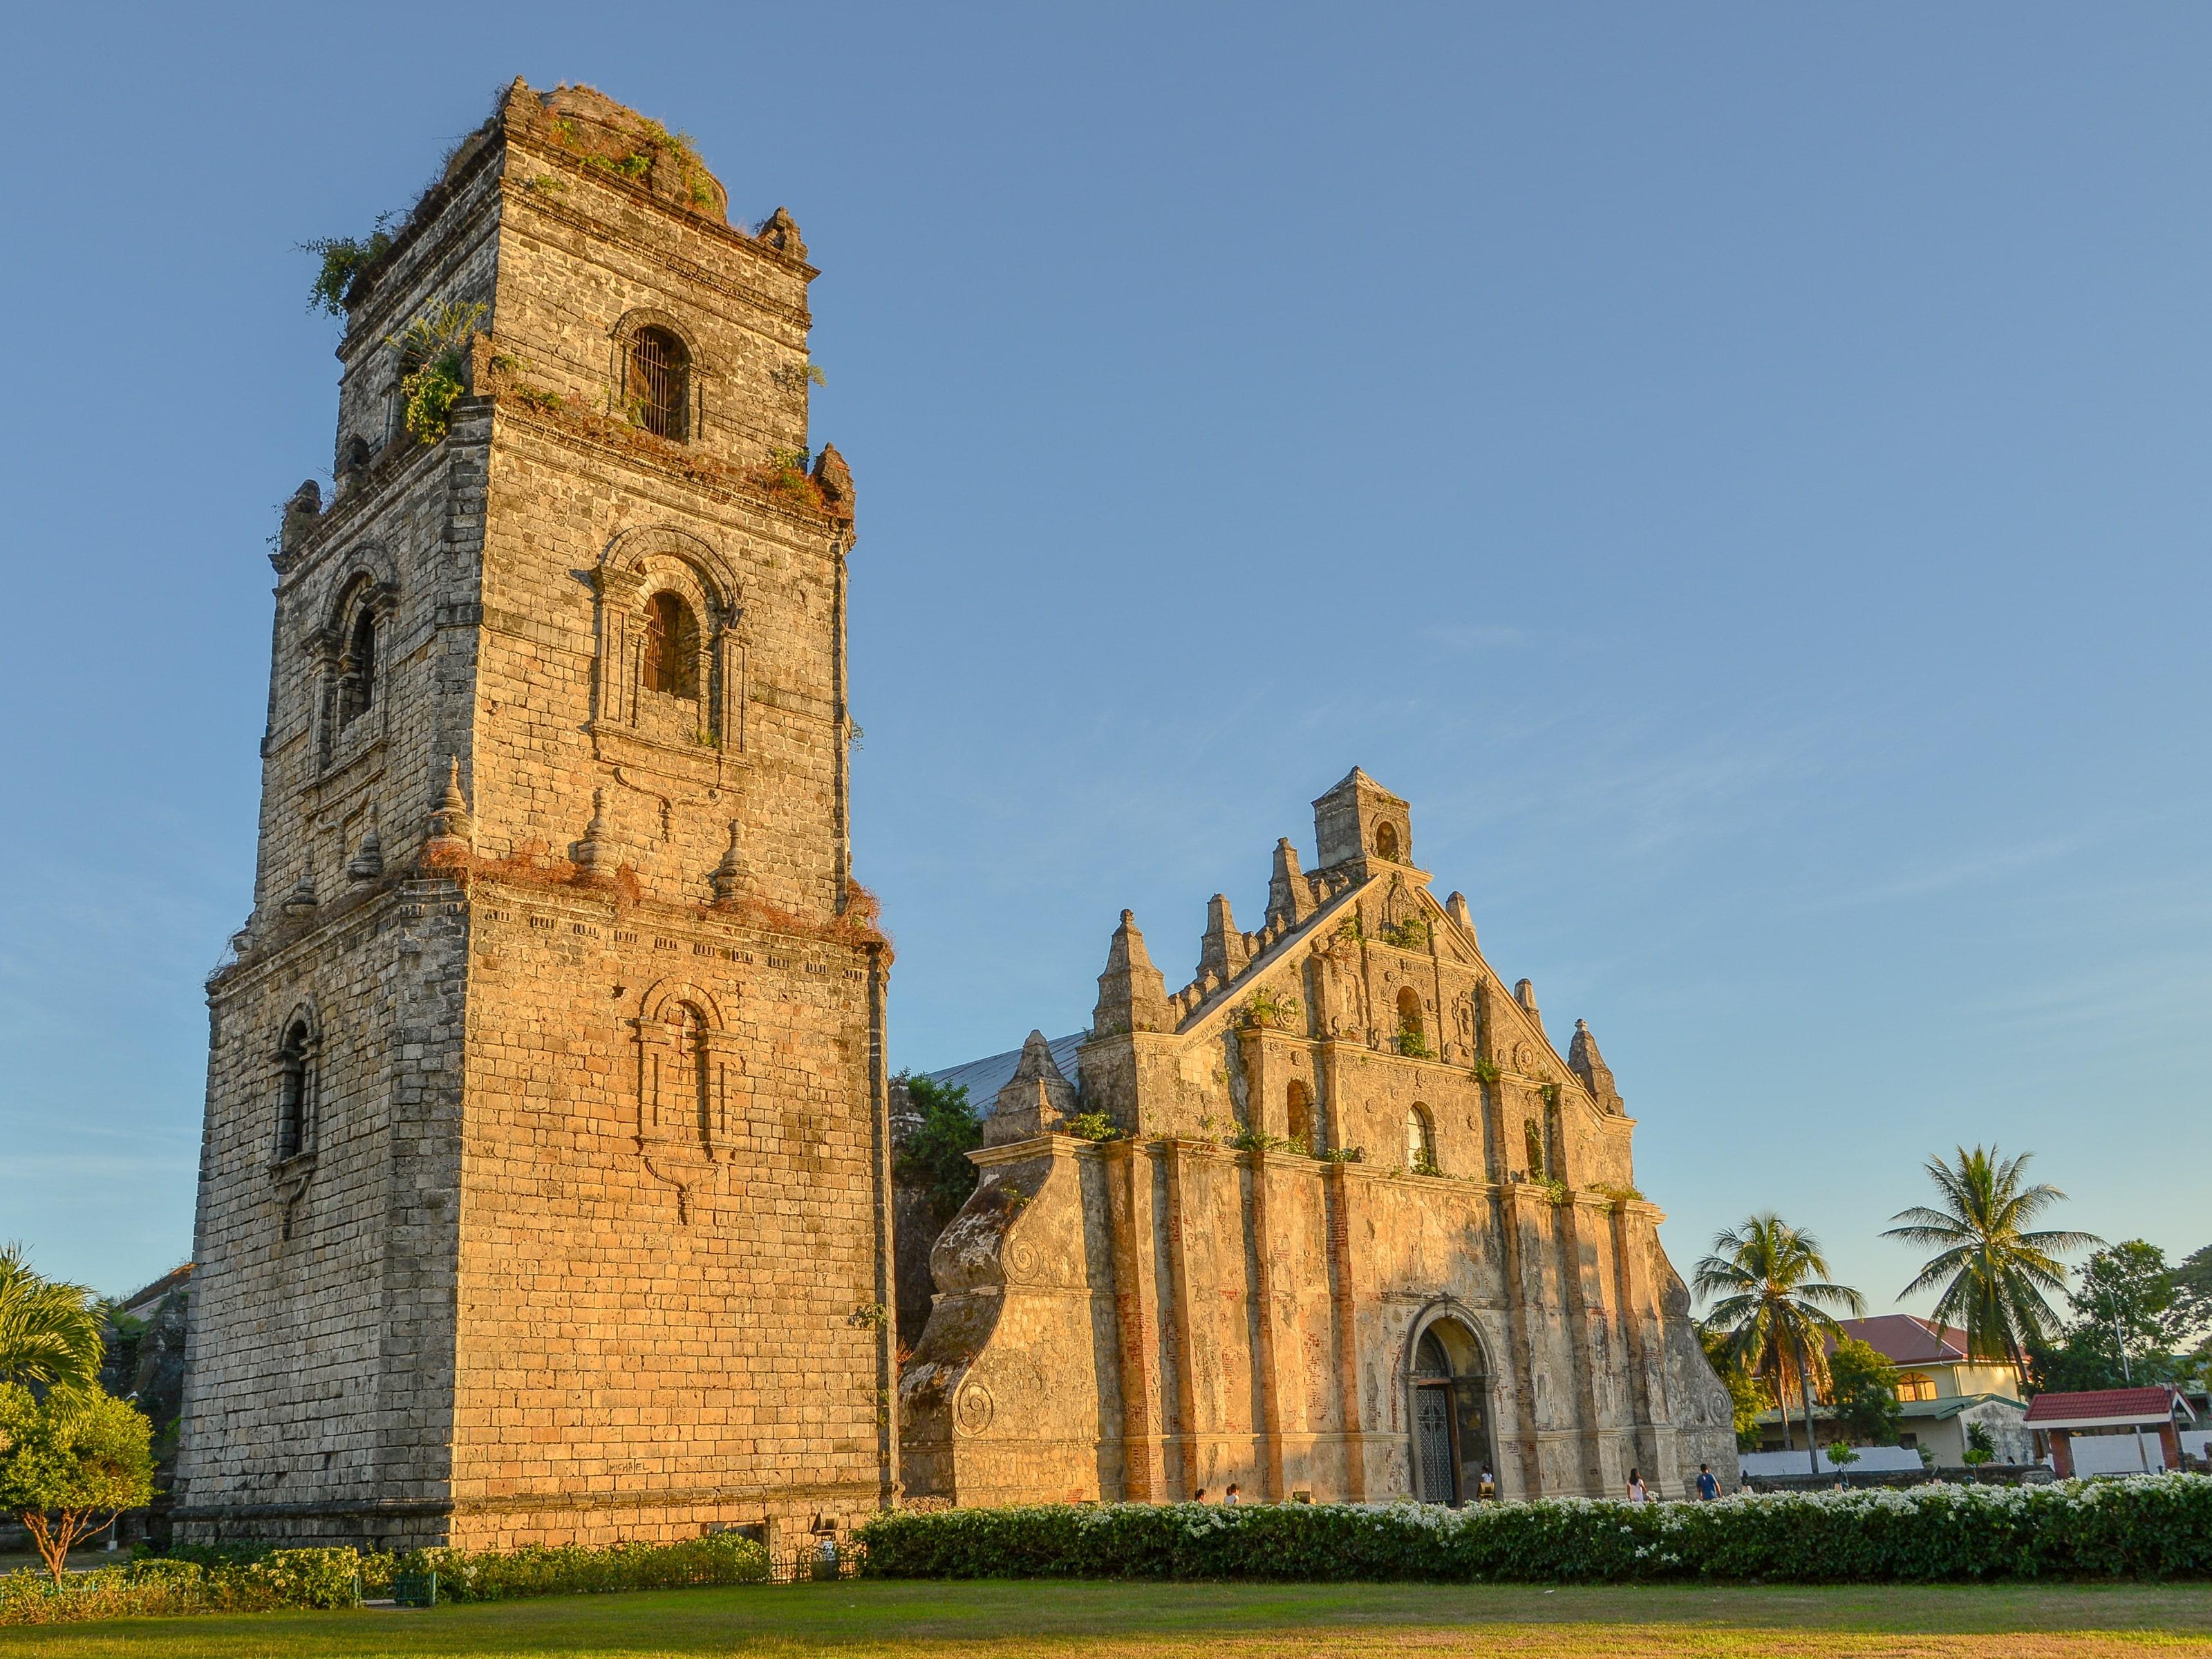 Paoay Church in Laoag, Ilocos Norte